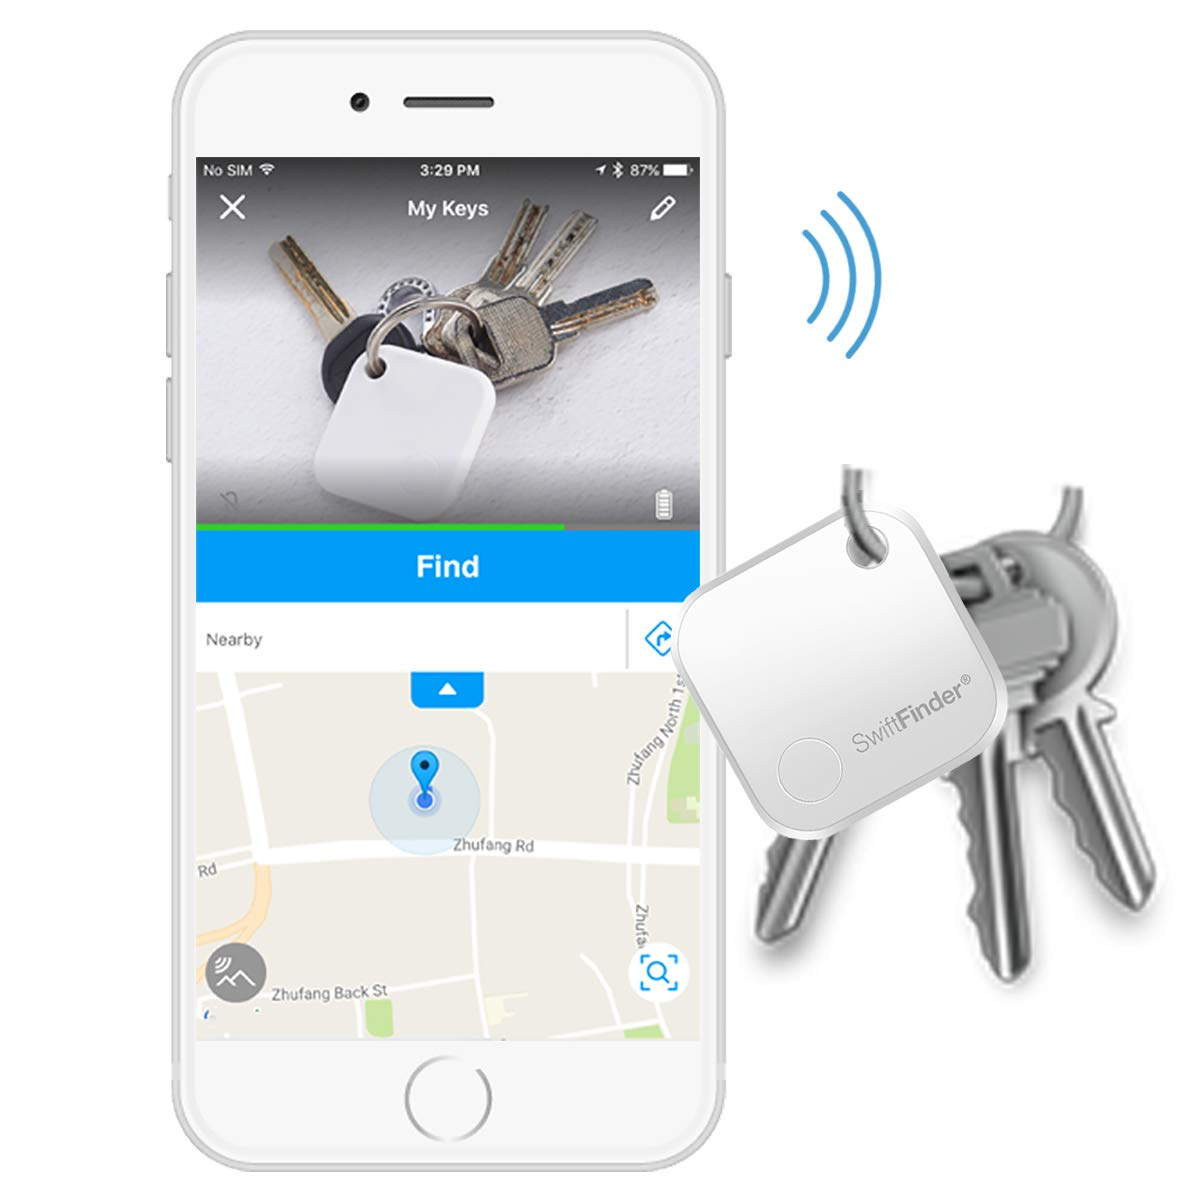 Key Finder Locator,Key Finder,Phone Finder,Bluetooth Tracker for Keys,Wallet,Bag,Luggage,Smart Tag with App Control